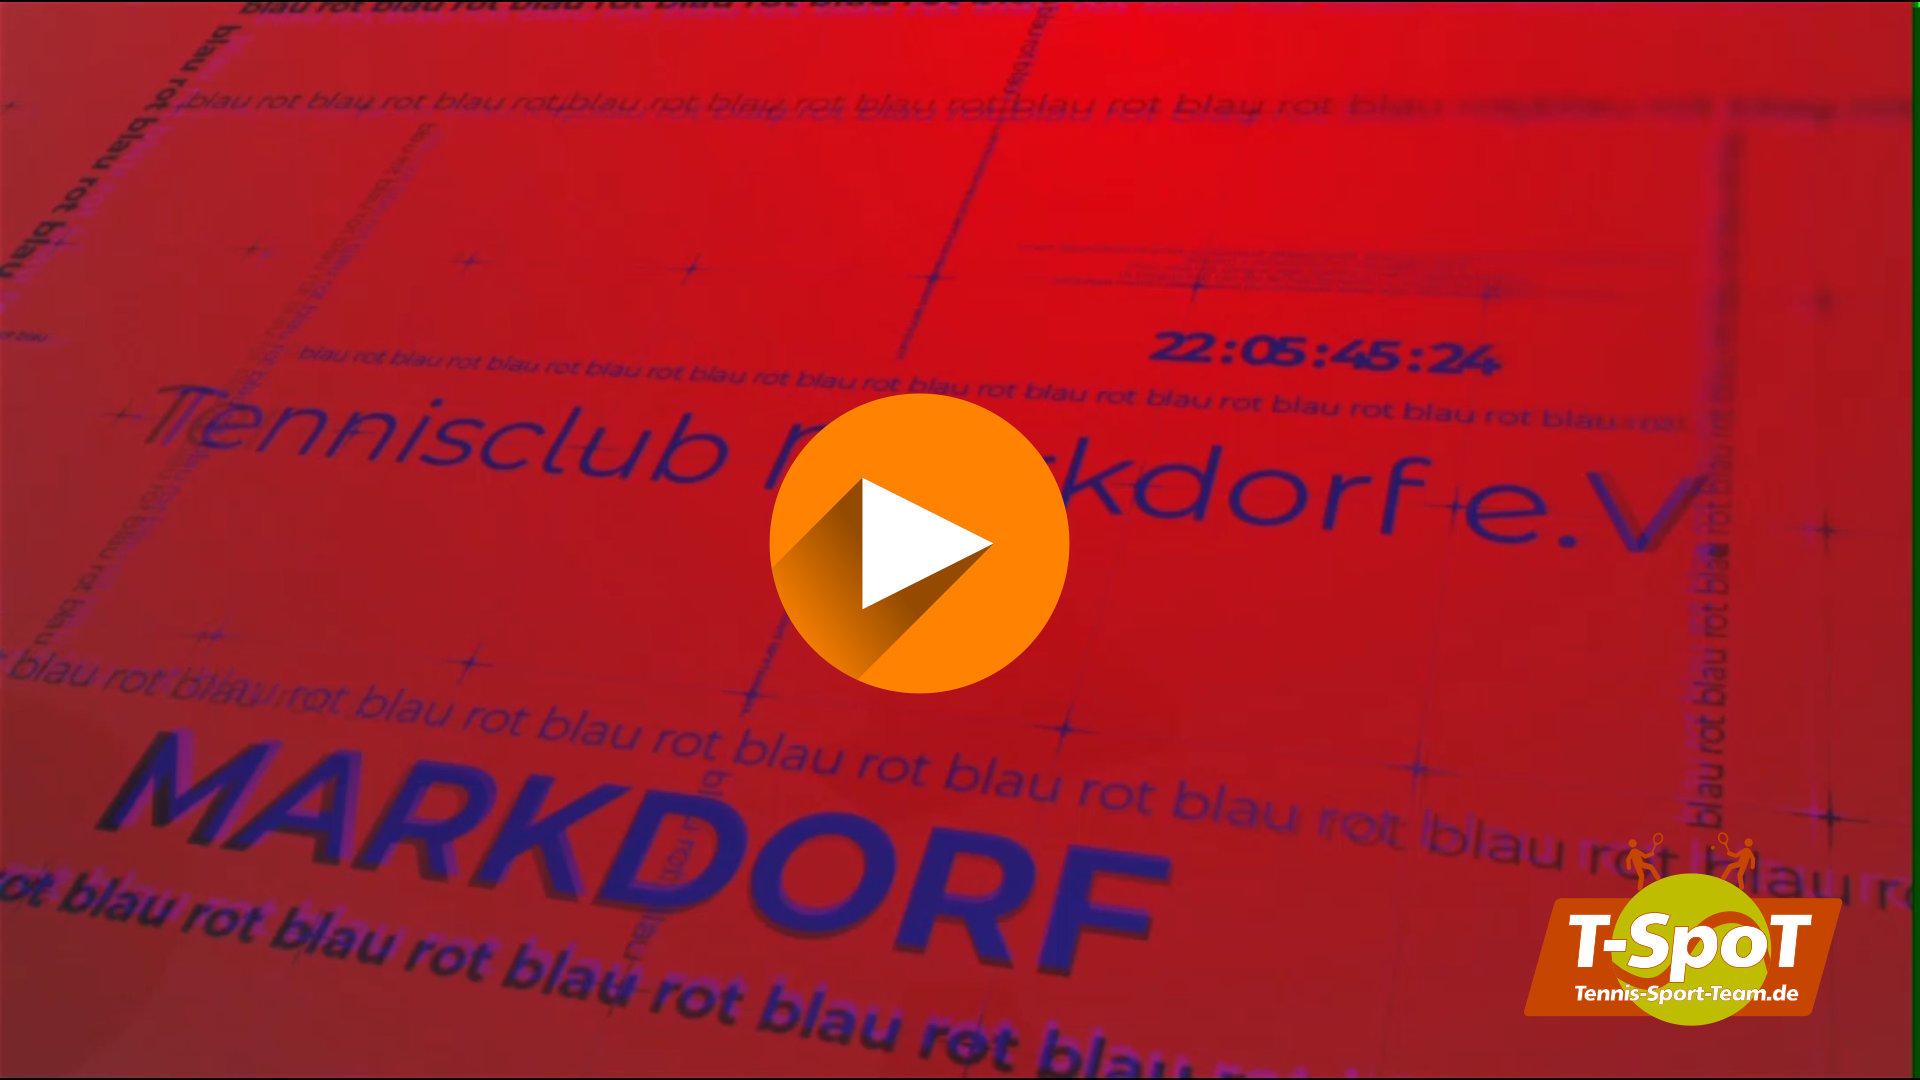 T-SpoT Clubrace / TC Markdorf Video | www.clubrace.cadaiungo.de | T-SpoT - Tennis-Sport-Team.de